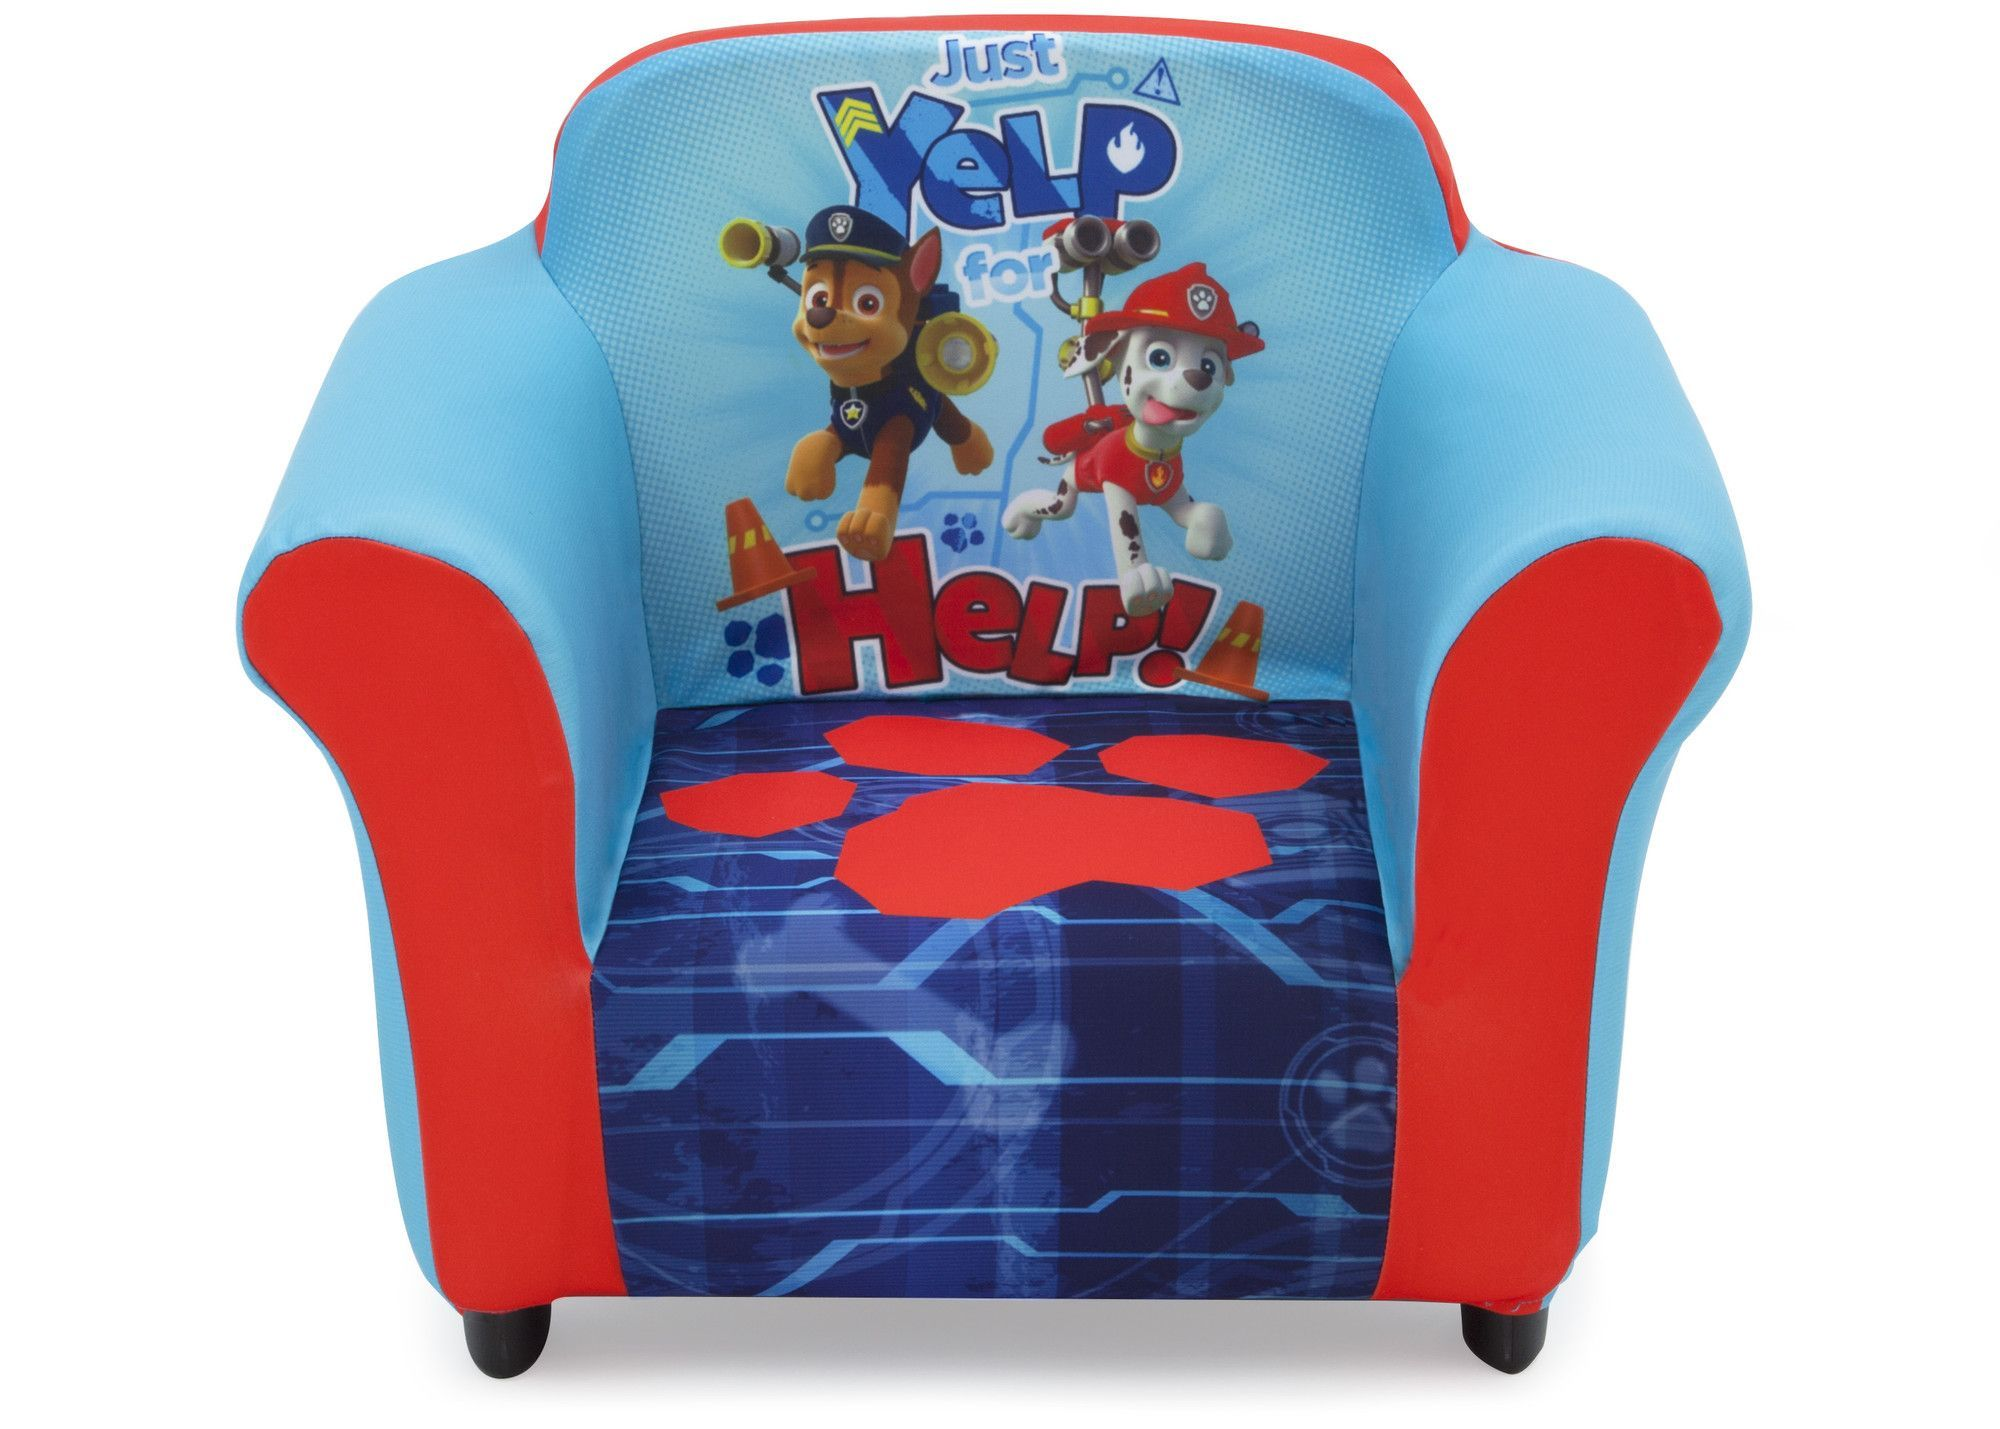 Paw Patrol Flip Open Sofa Target Sofala Rd Bathurst Nick Jr Kids Club Chair Products Pinterest